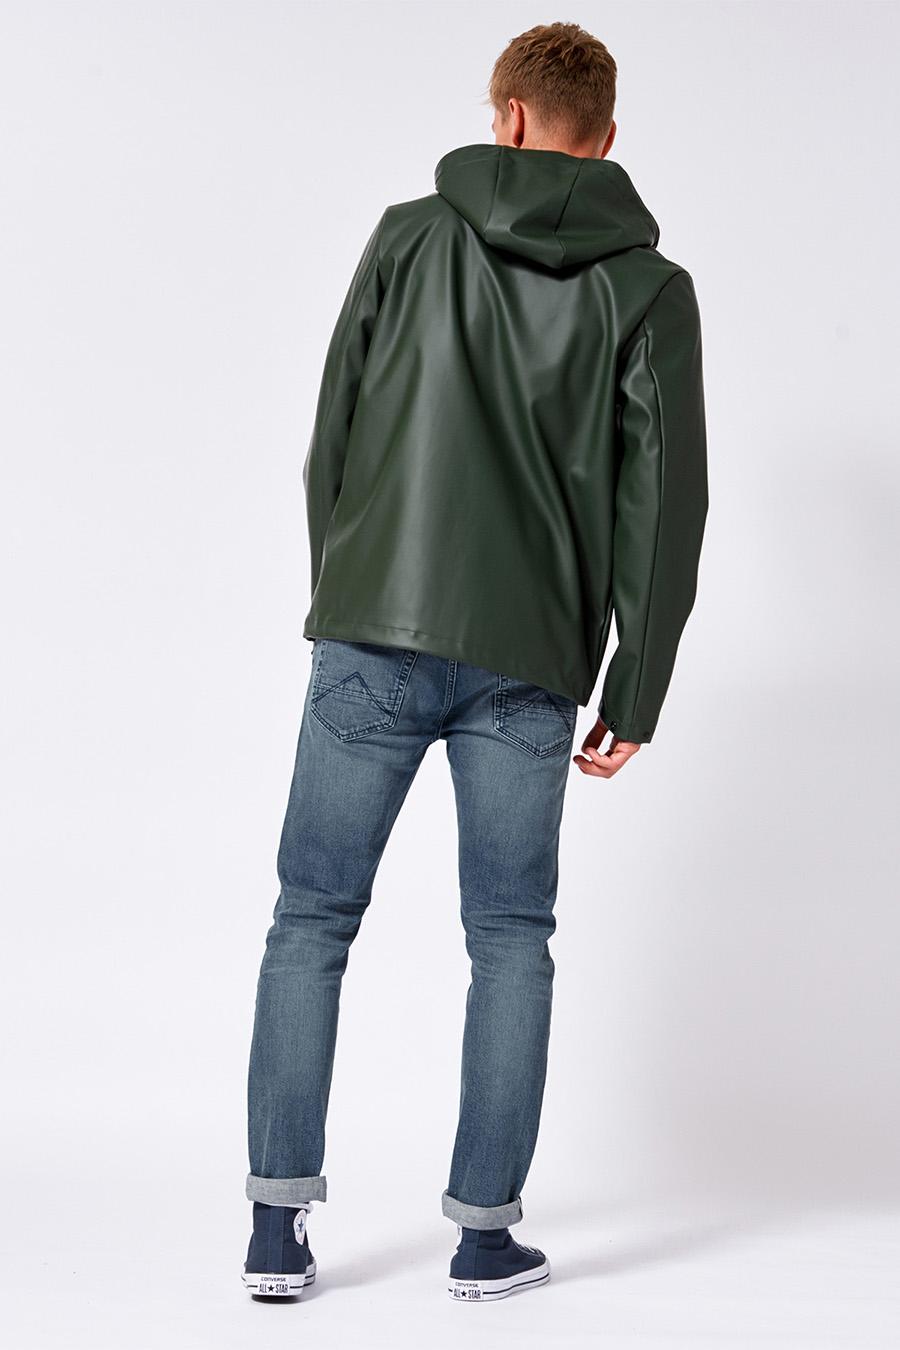 Joseph raincoat